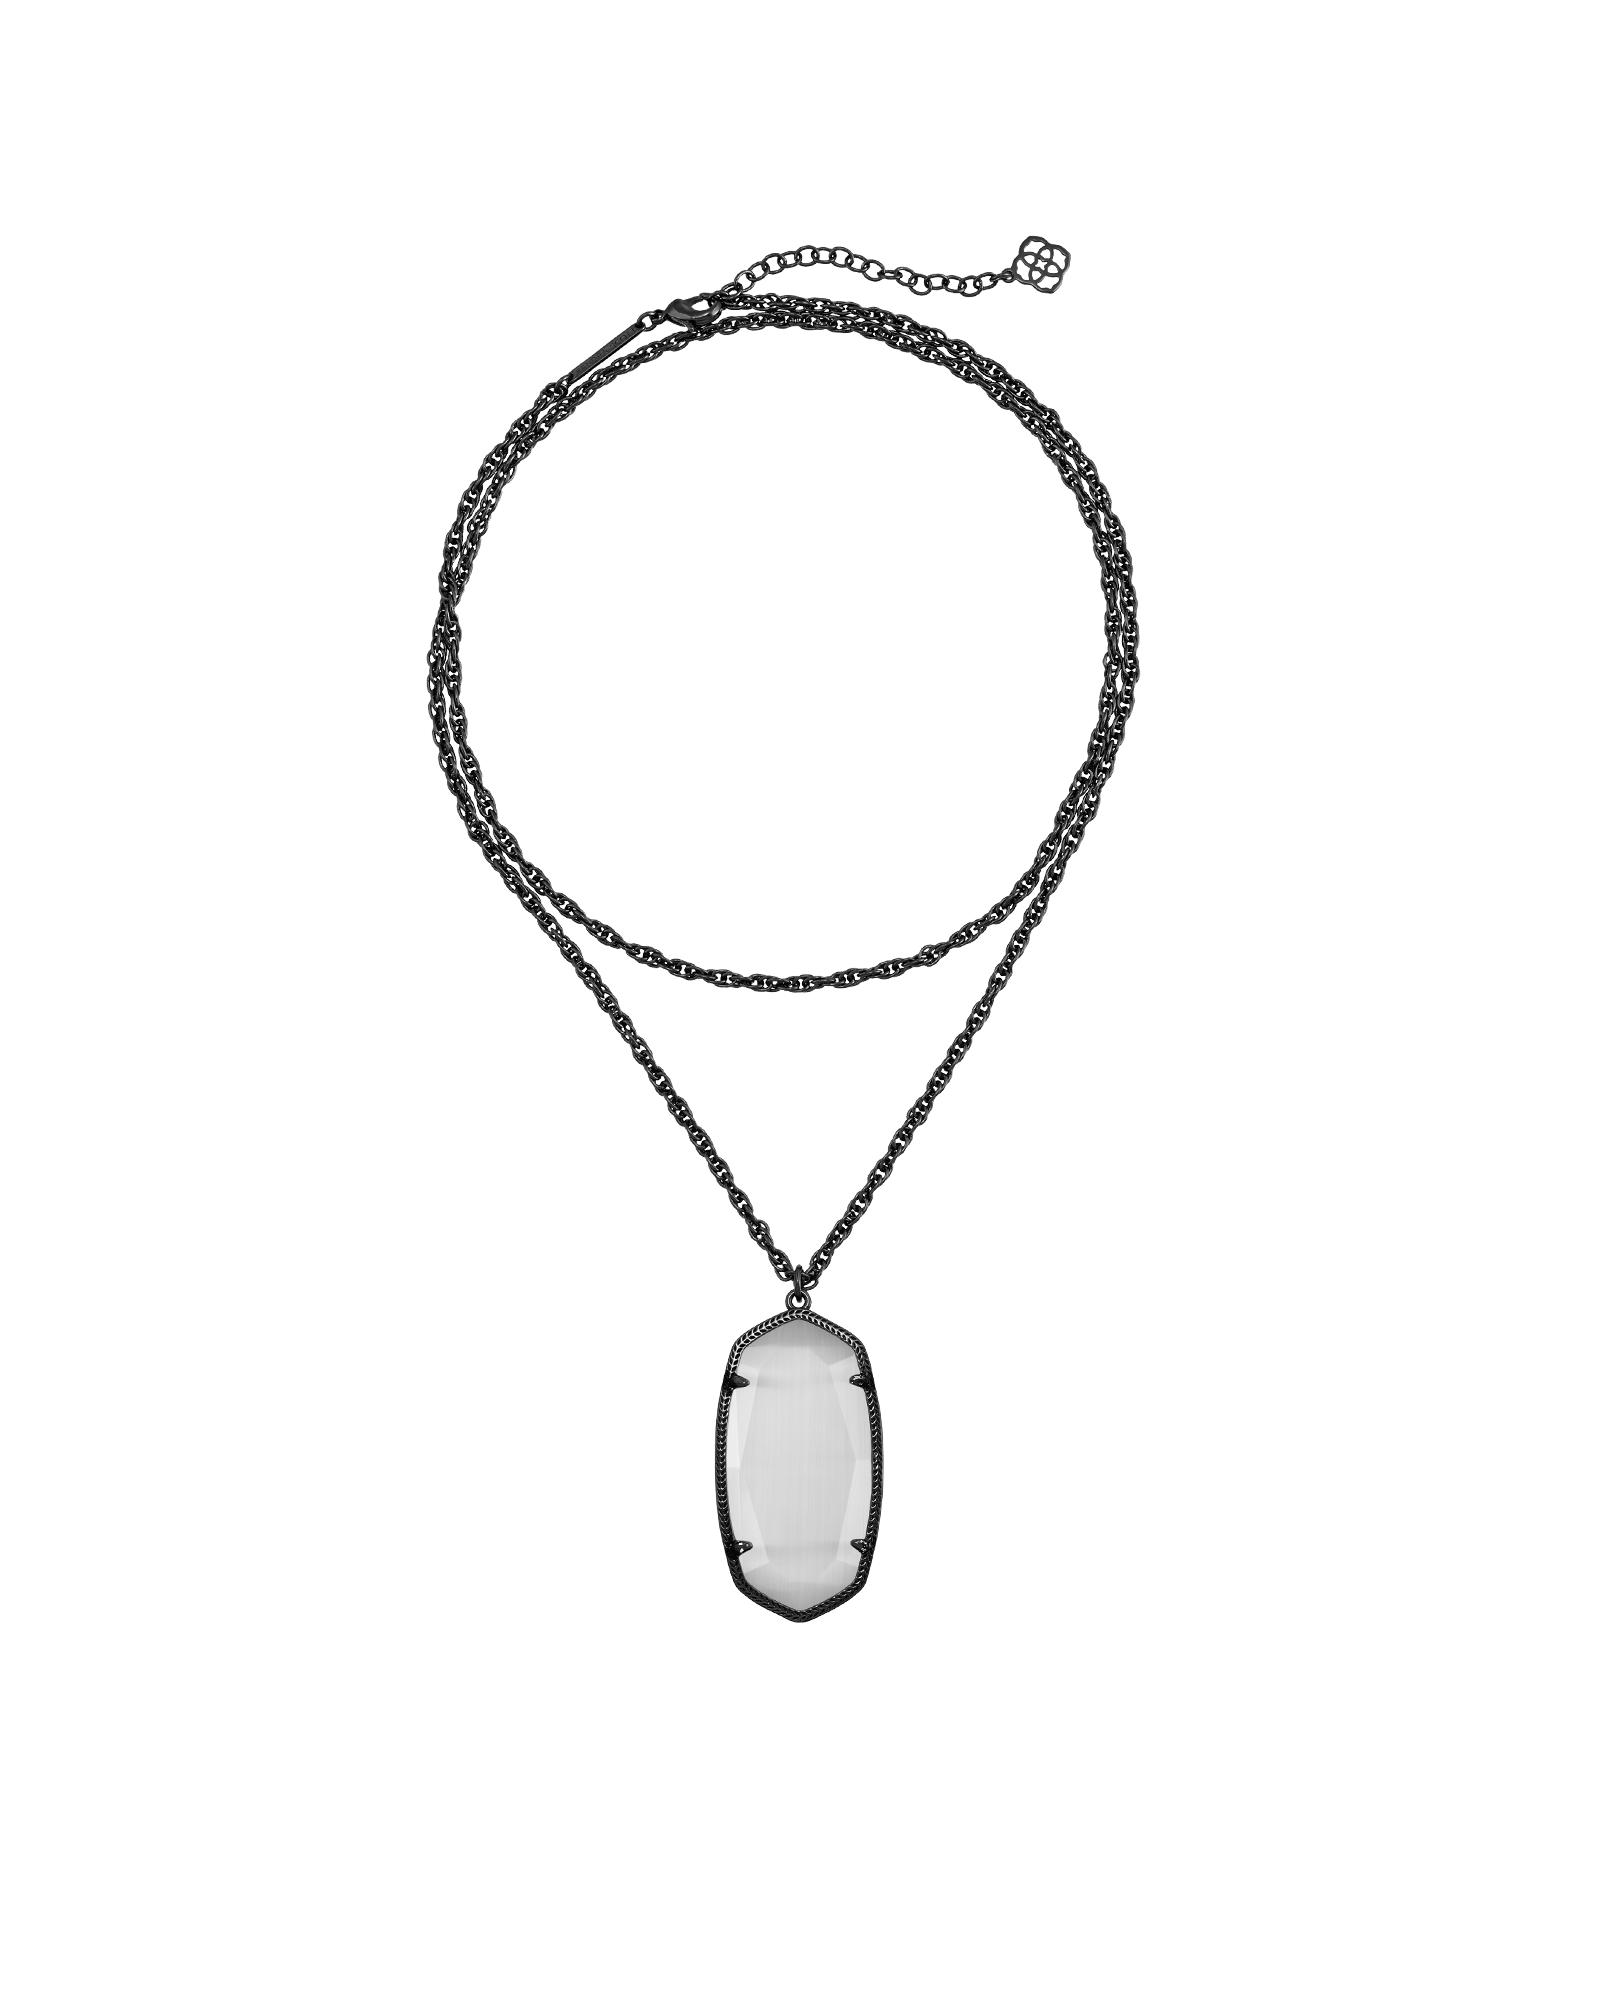 Rae gunmetal necklace in slate gingerus wish list pinterest